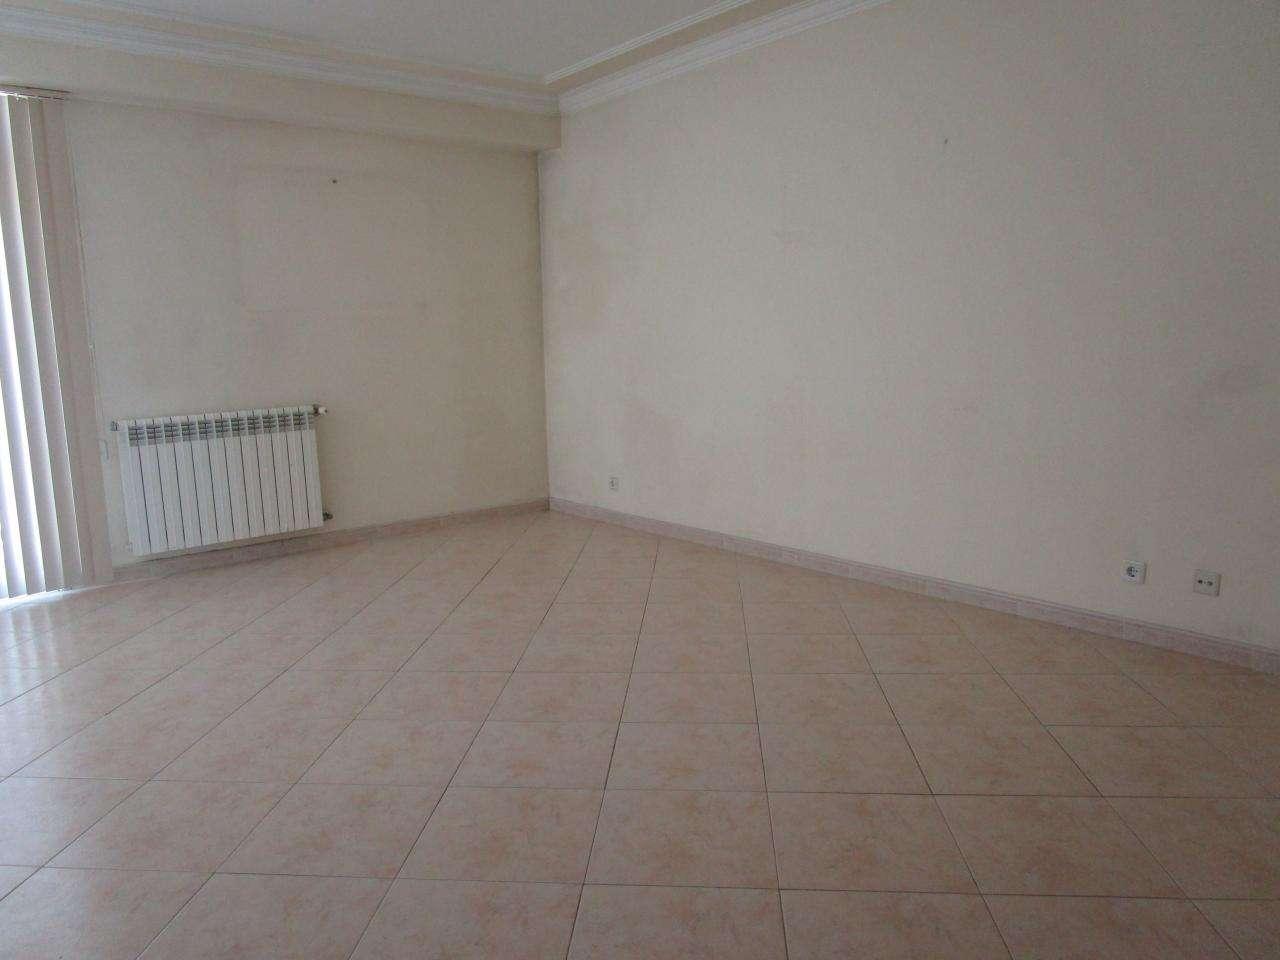 Apartamento para comprar, Vialonga, Vila Franca de Xira, Lisboa - Foto 4